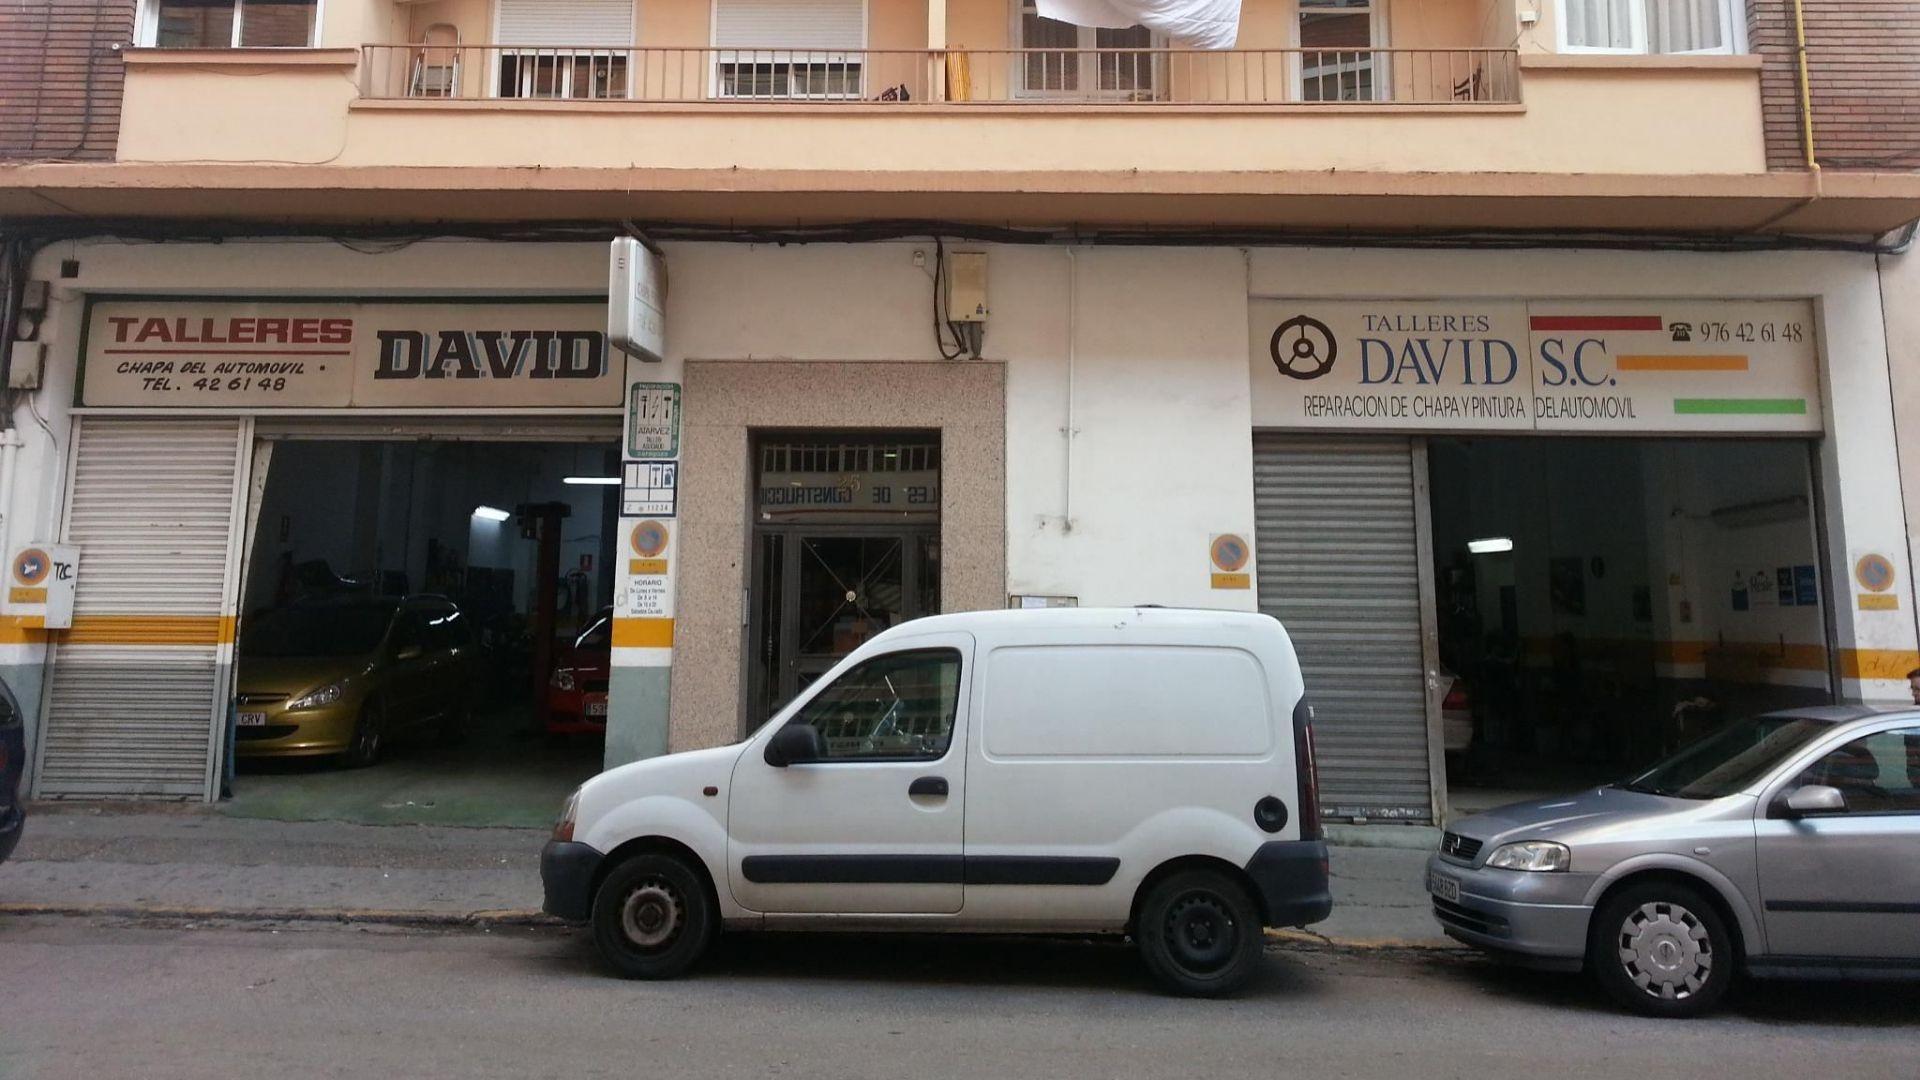 Talleres David